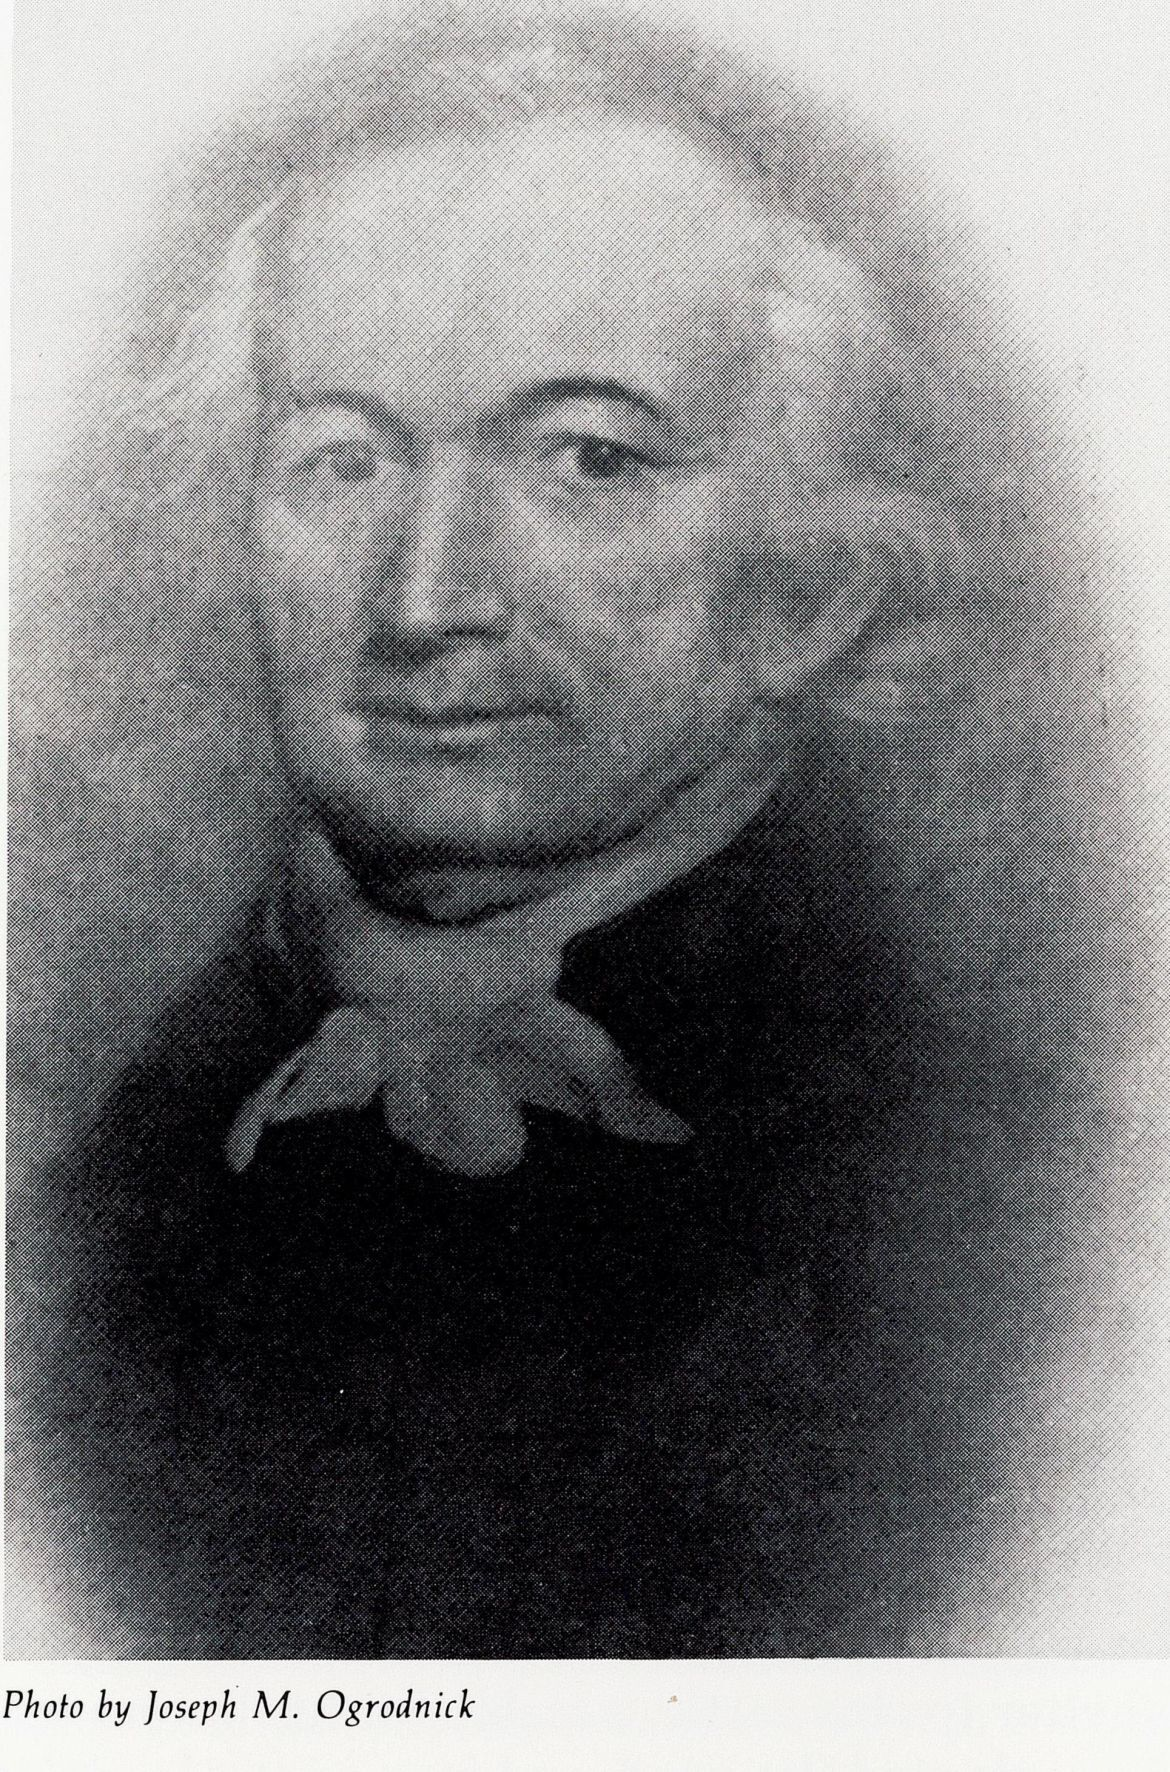 Robert S. Rose